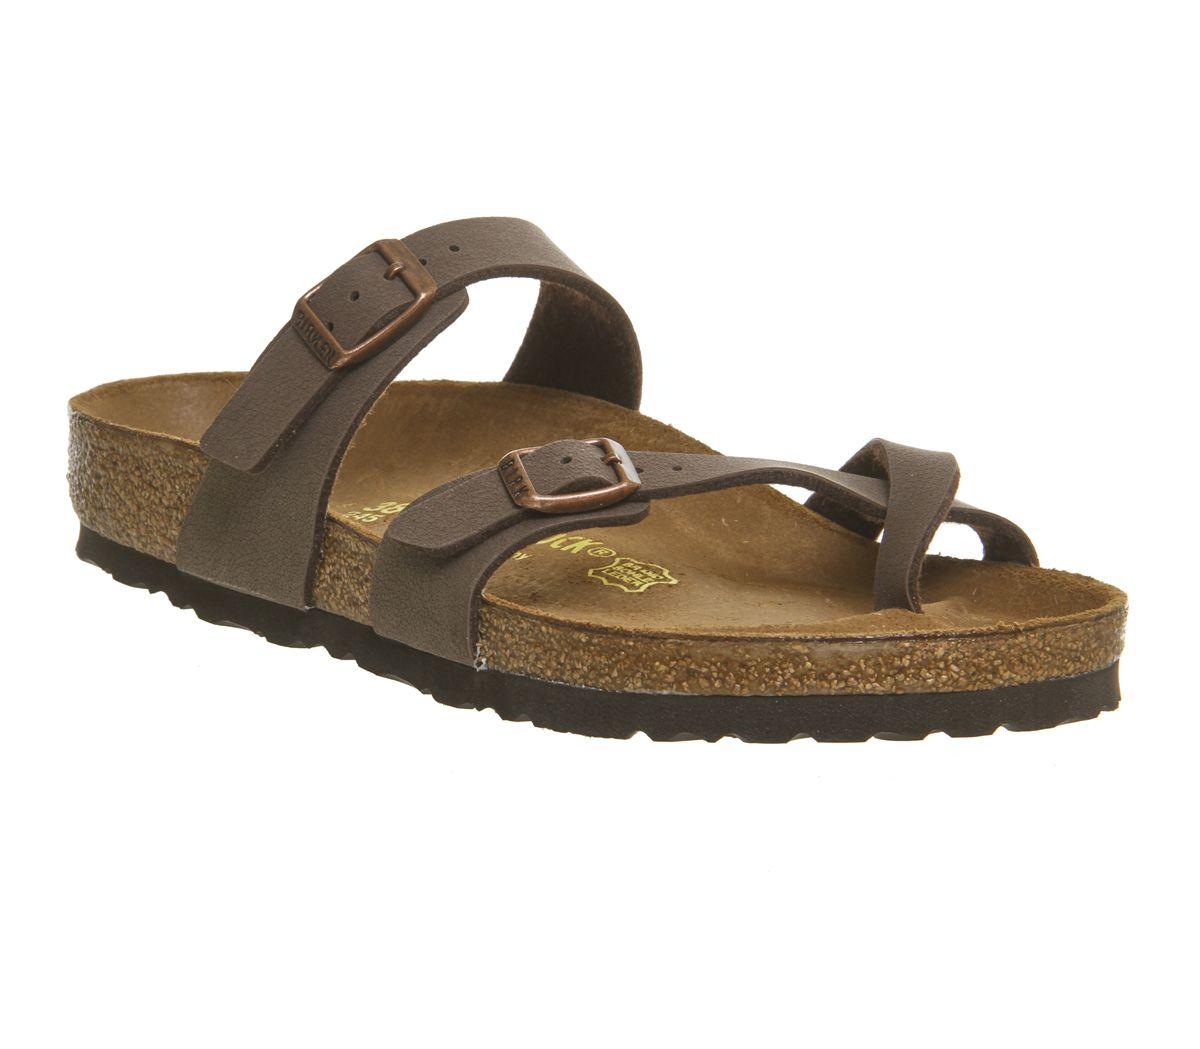 5d10b22bef5 Birkenstock Mayari Cross Strap Sandals Mocha - Sandals